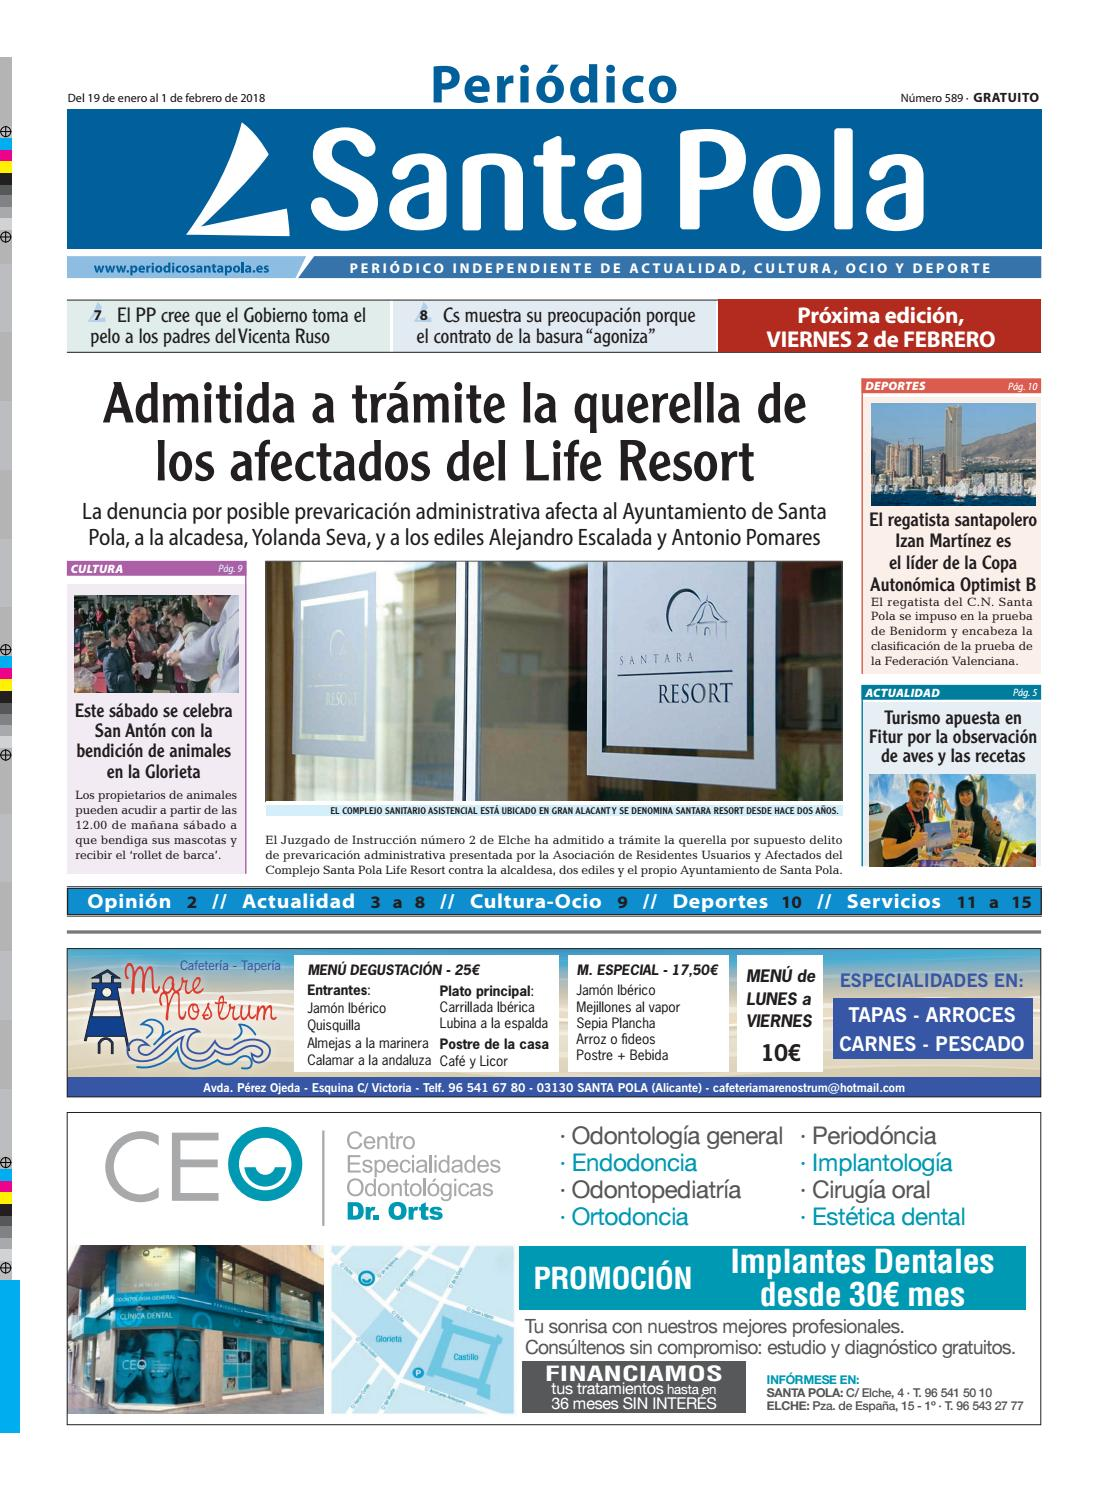 Periódico Santa Pola 19/1/18 nº 589 by Periódico Santa Pola - issuu